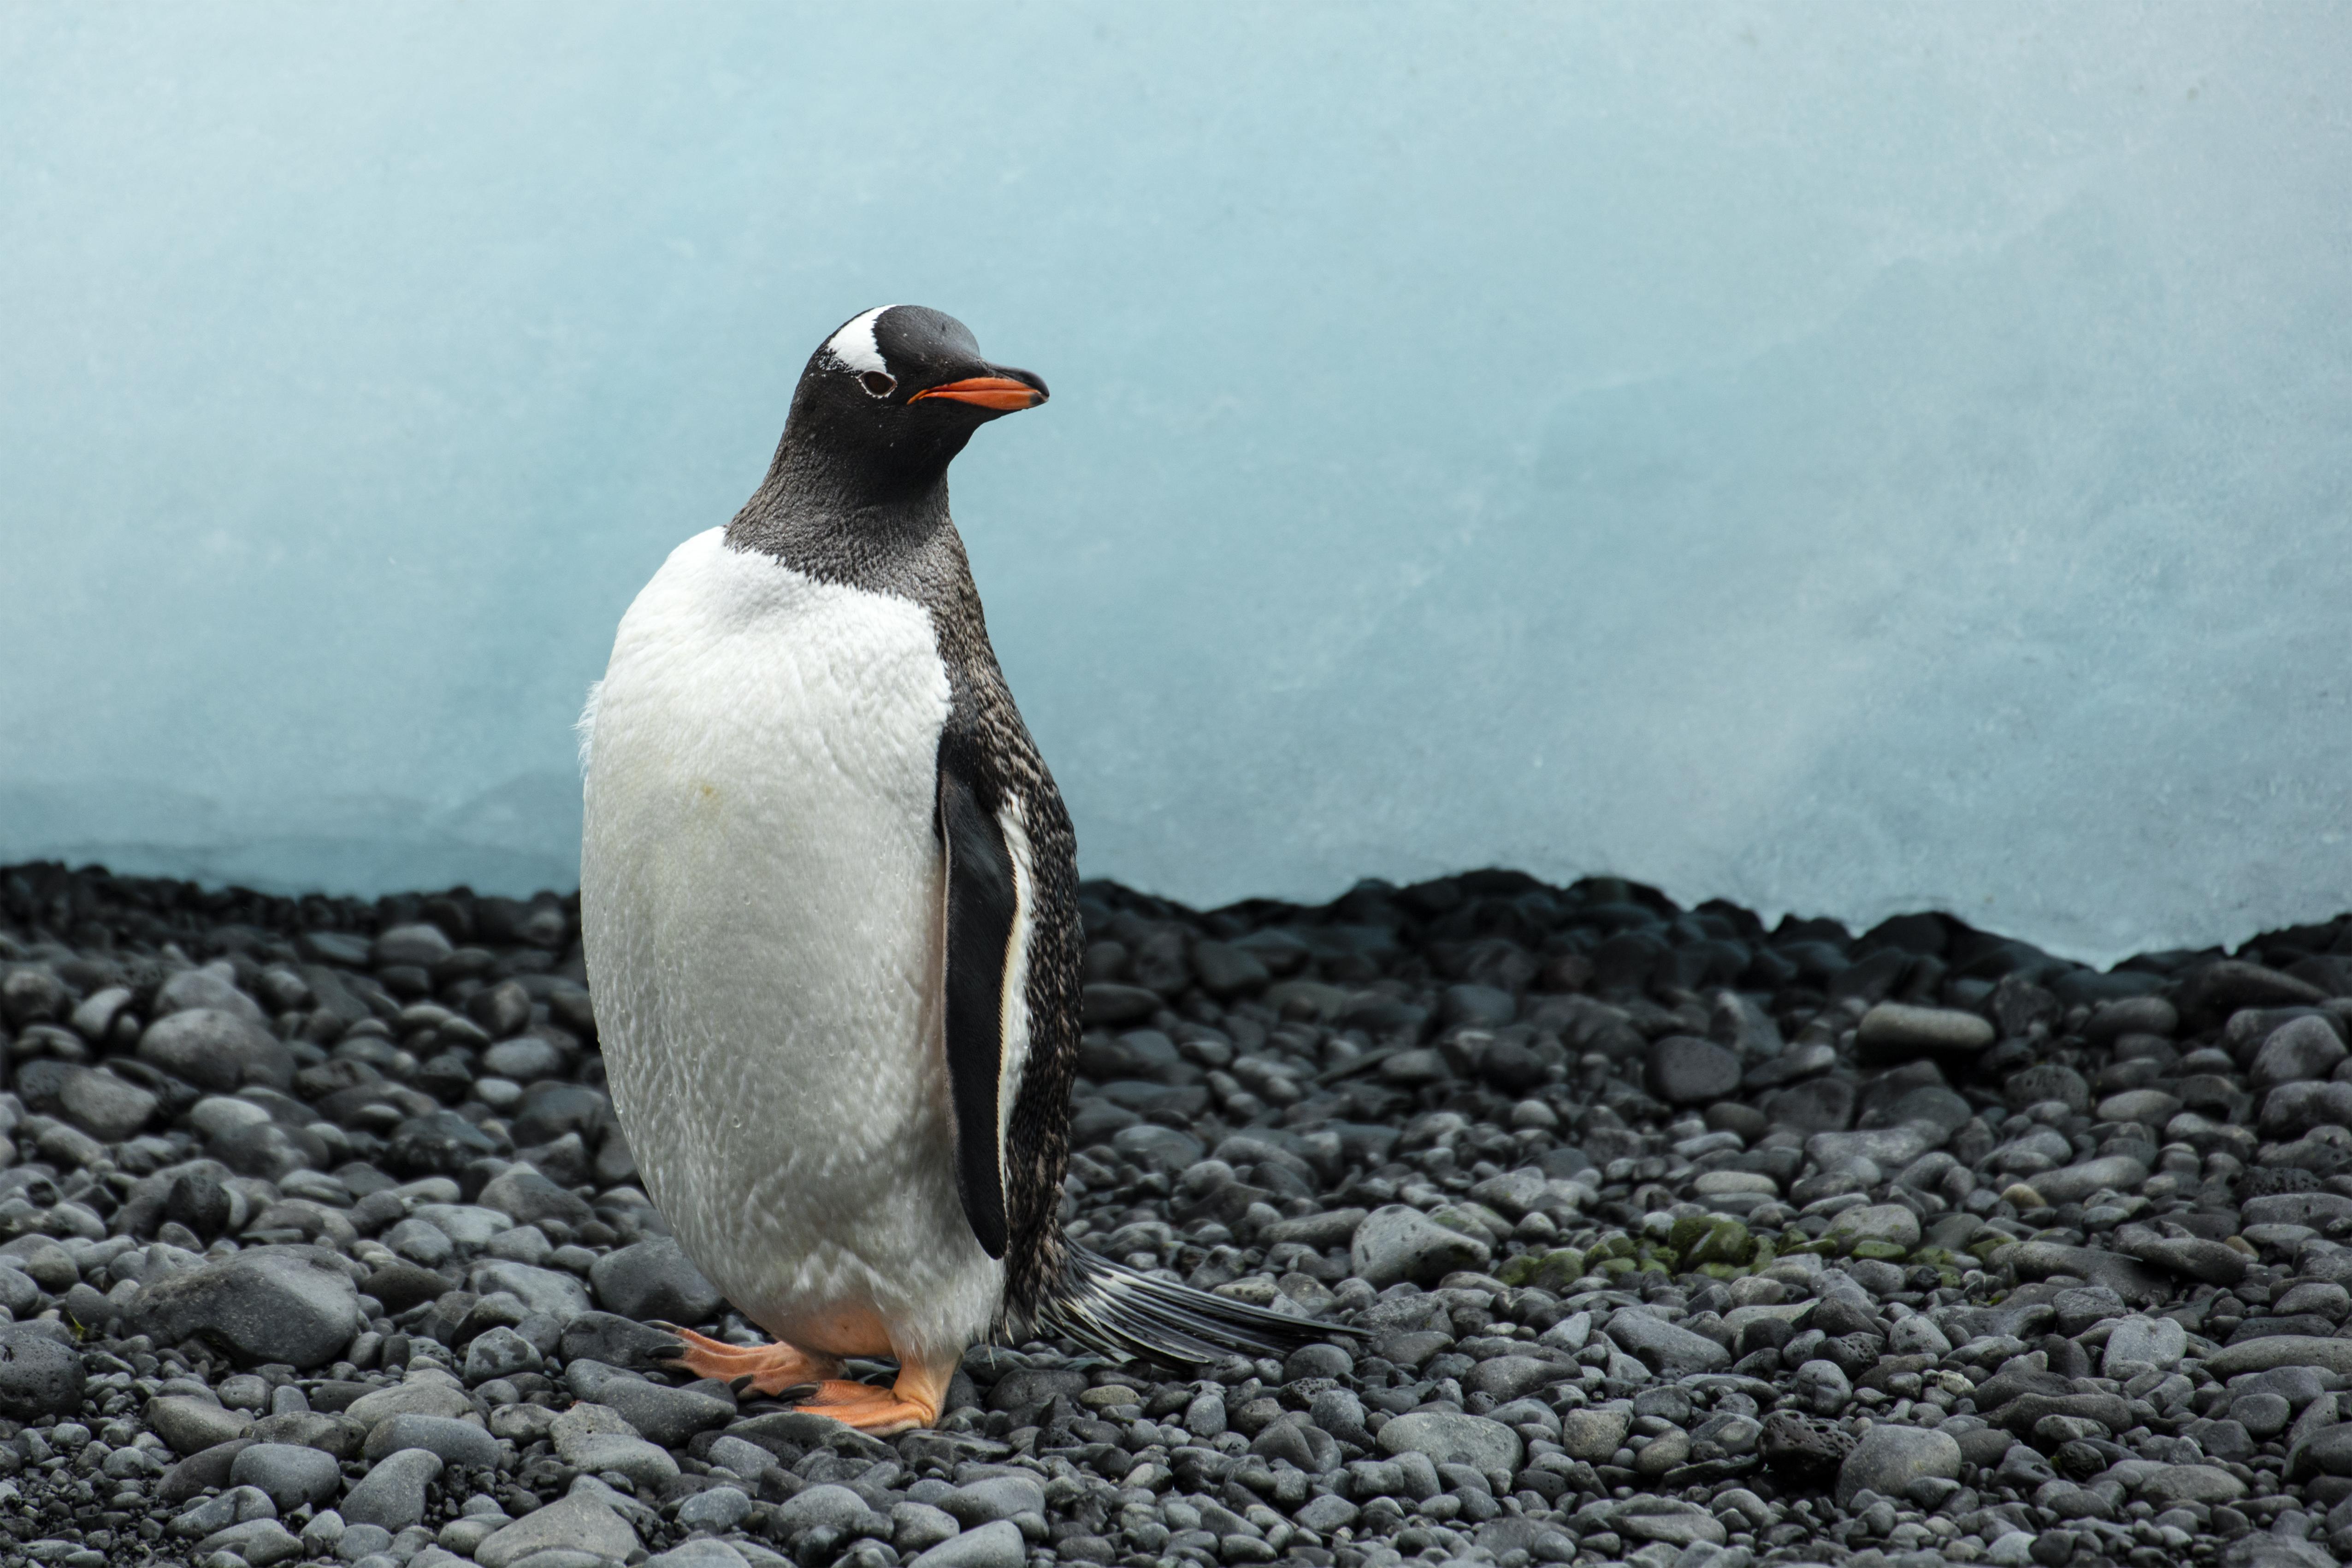 Gentoo wikipedia . Clipart penquin penguin egg